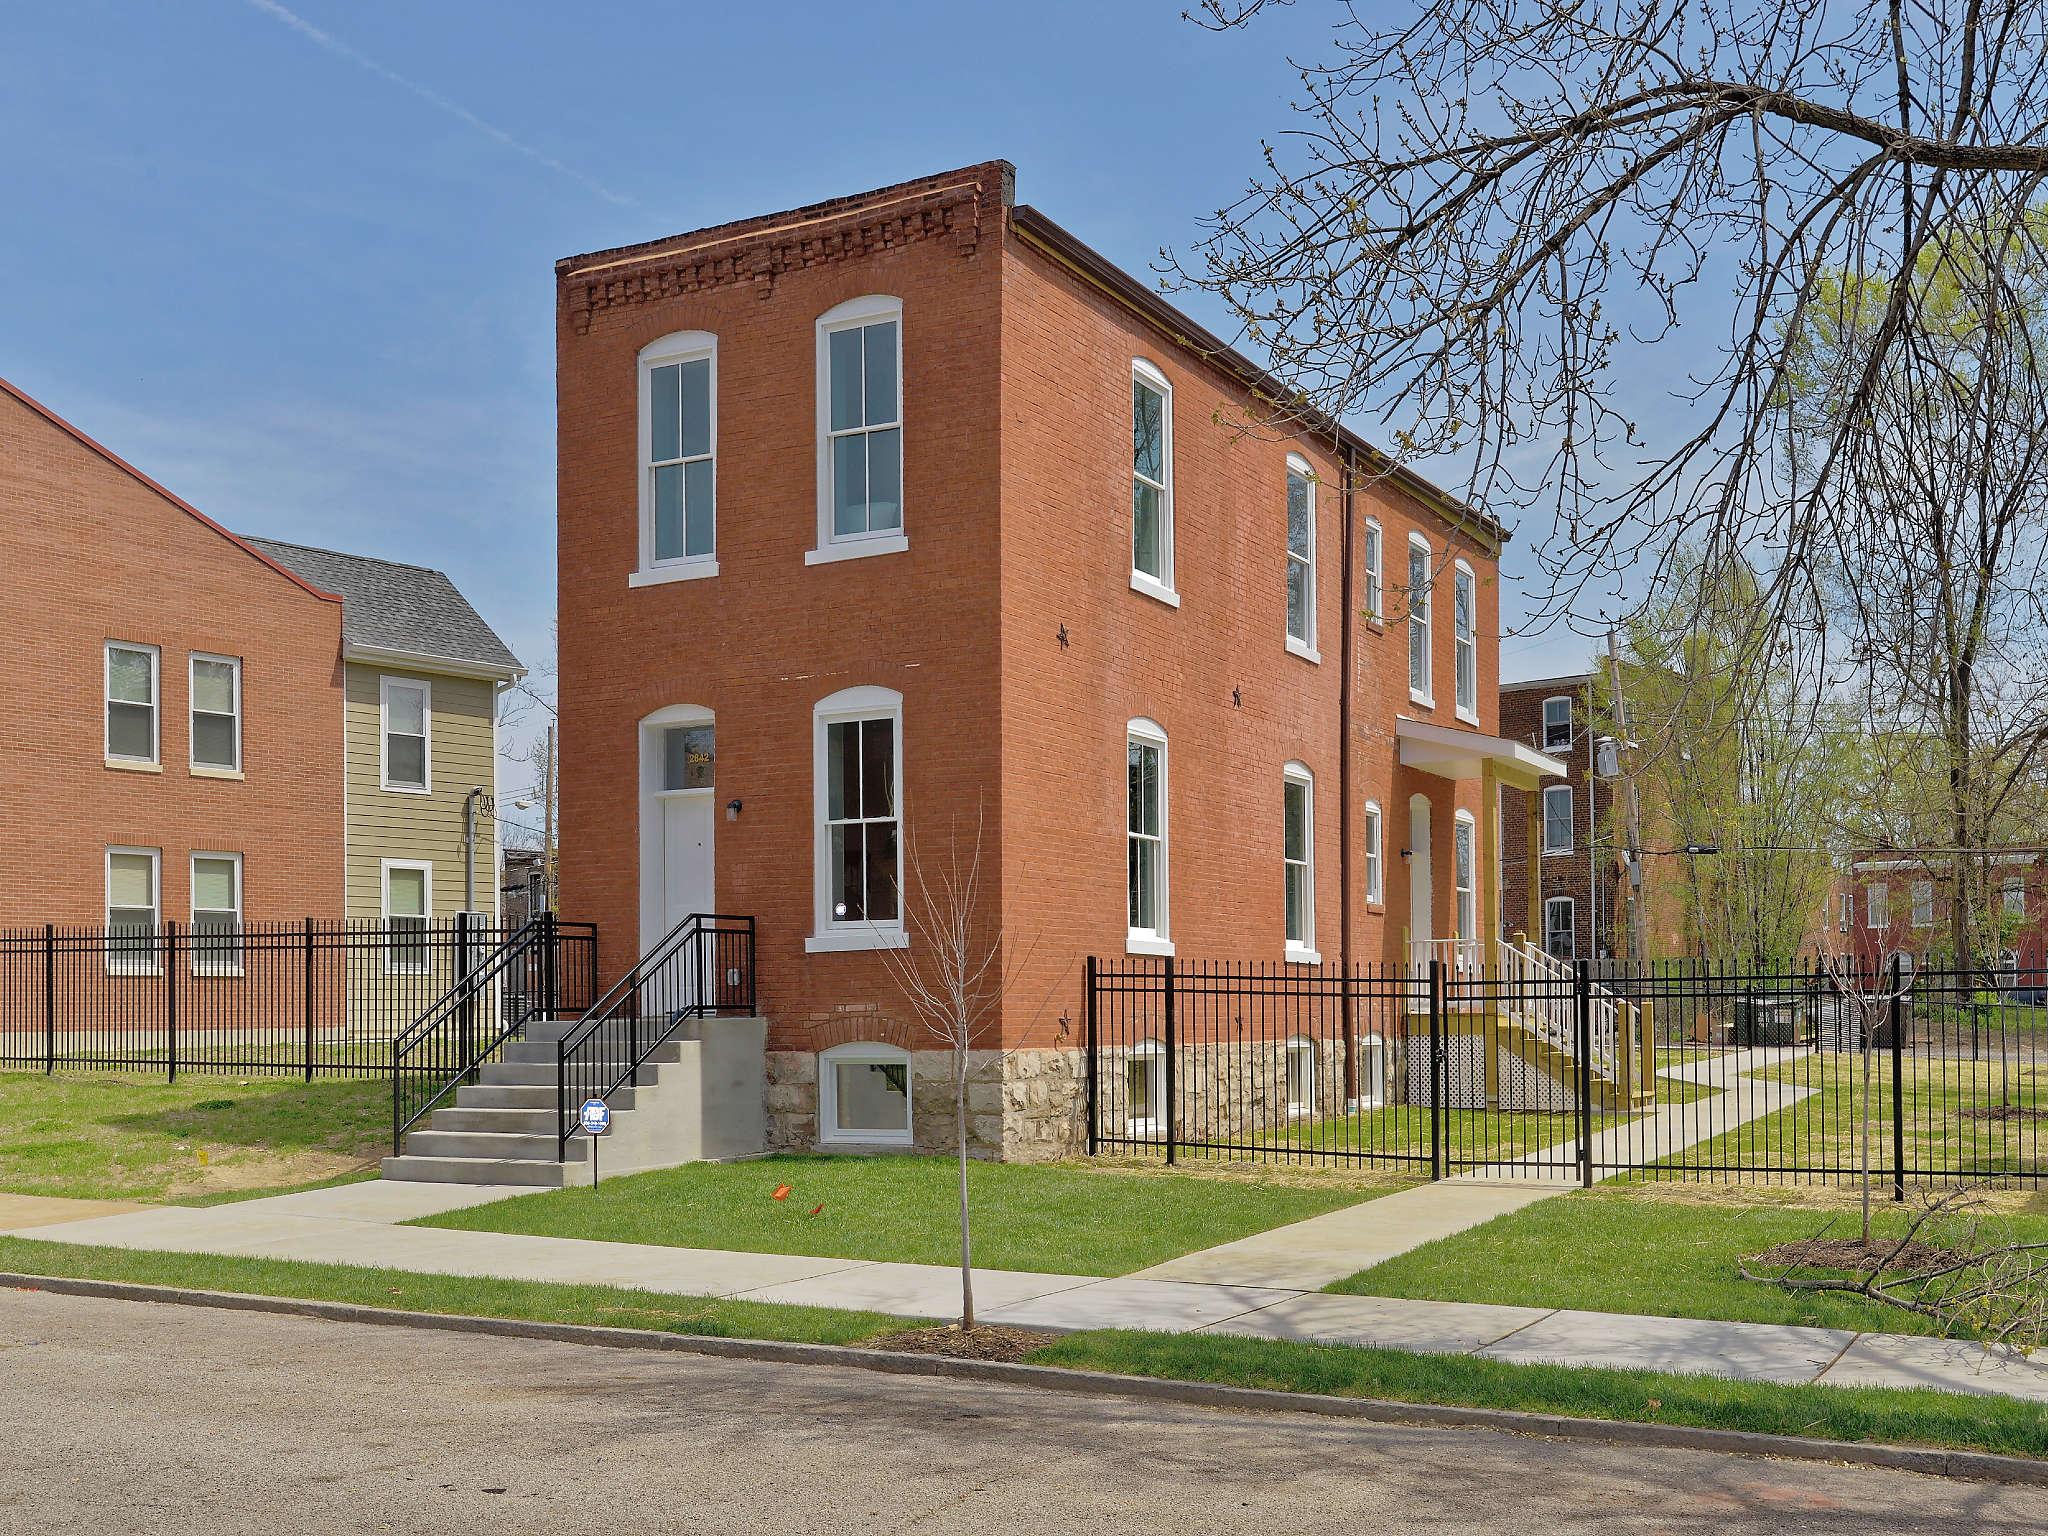 2842 Ohio Ave, St Louis 63118-1516